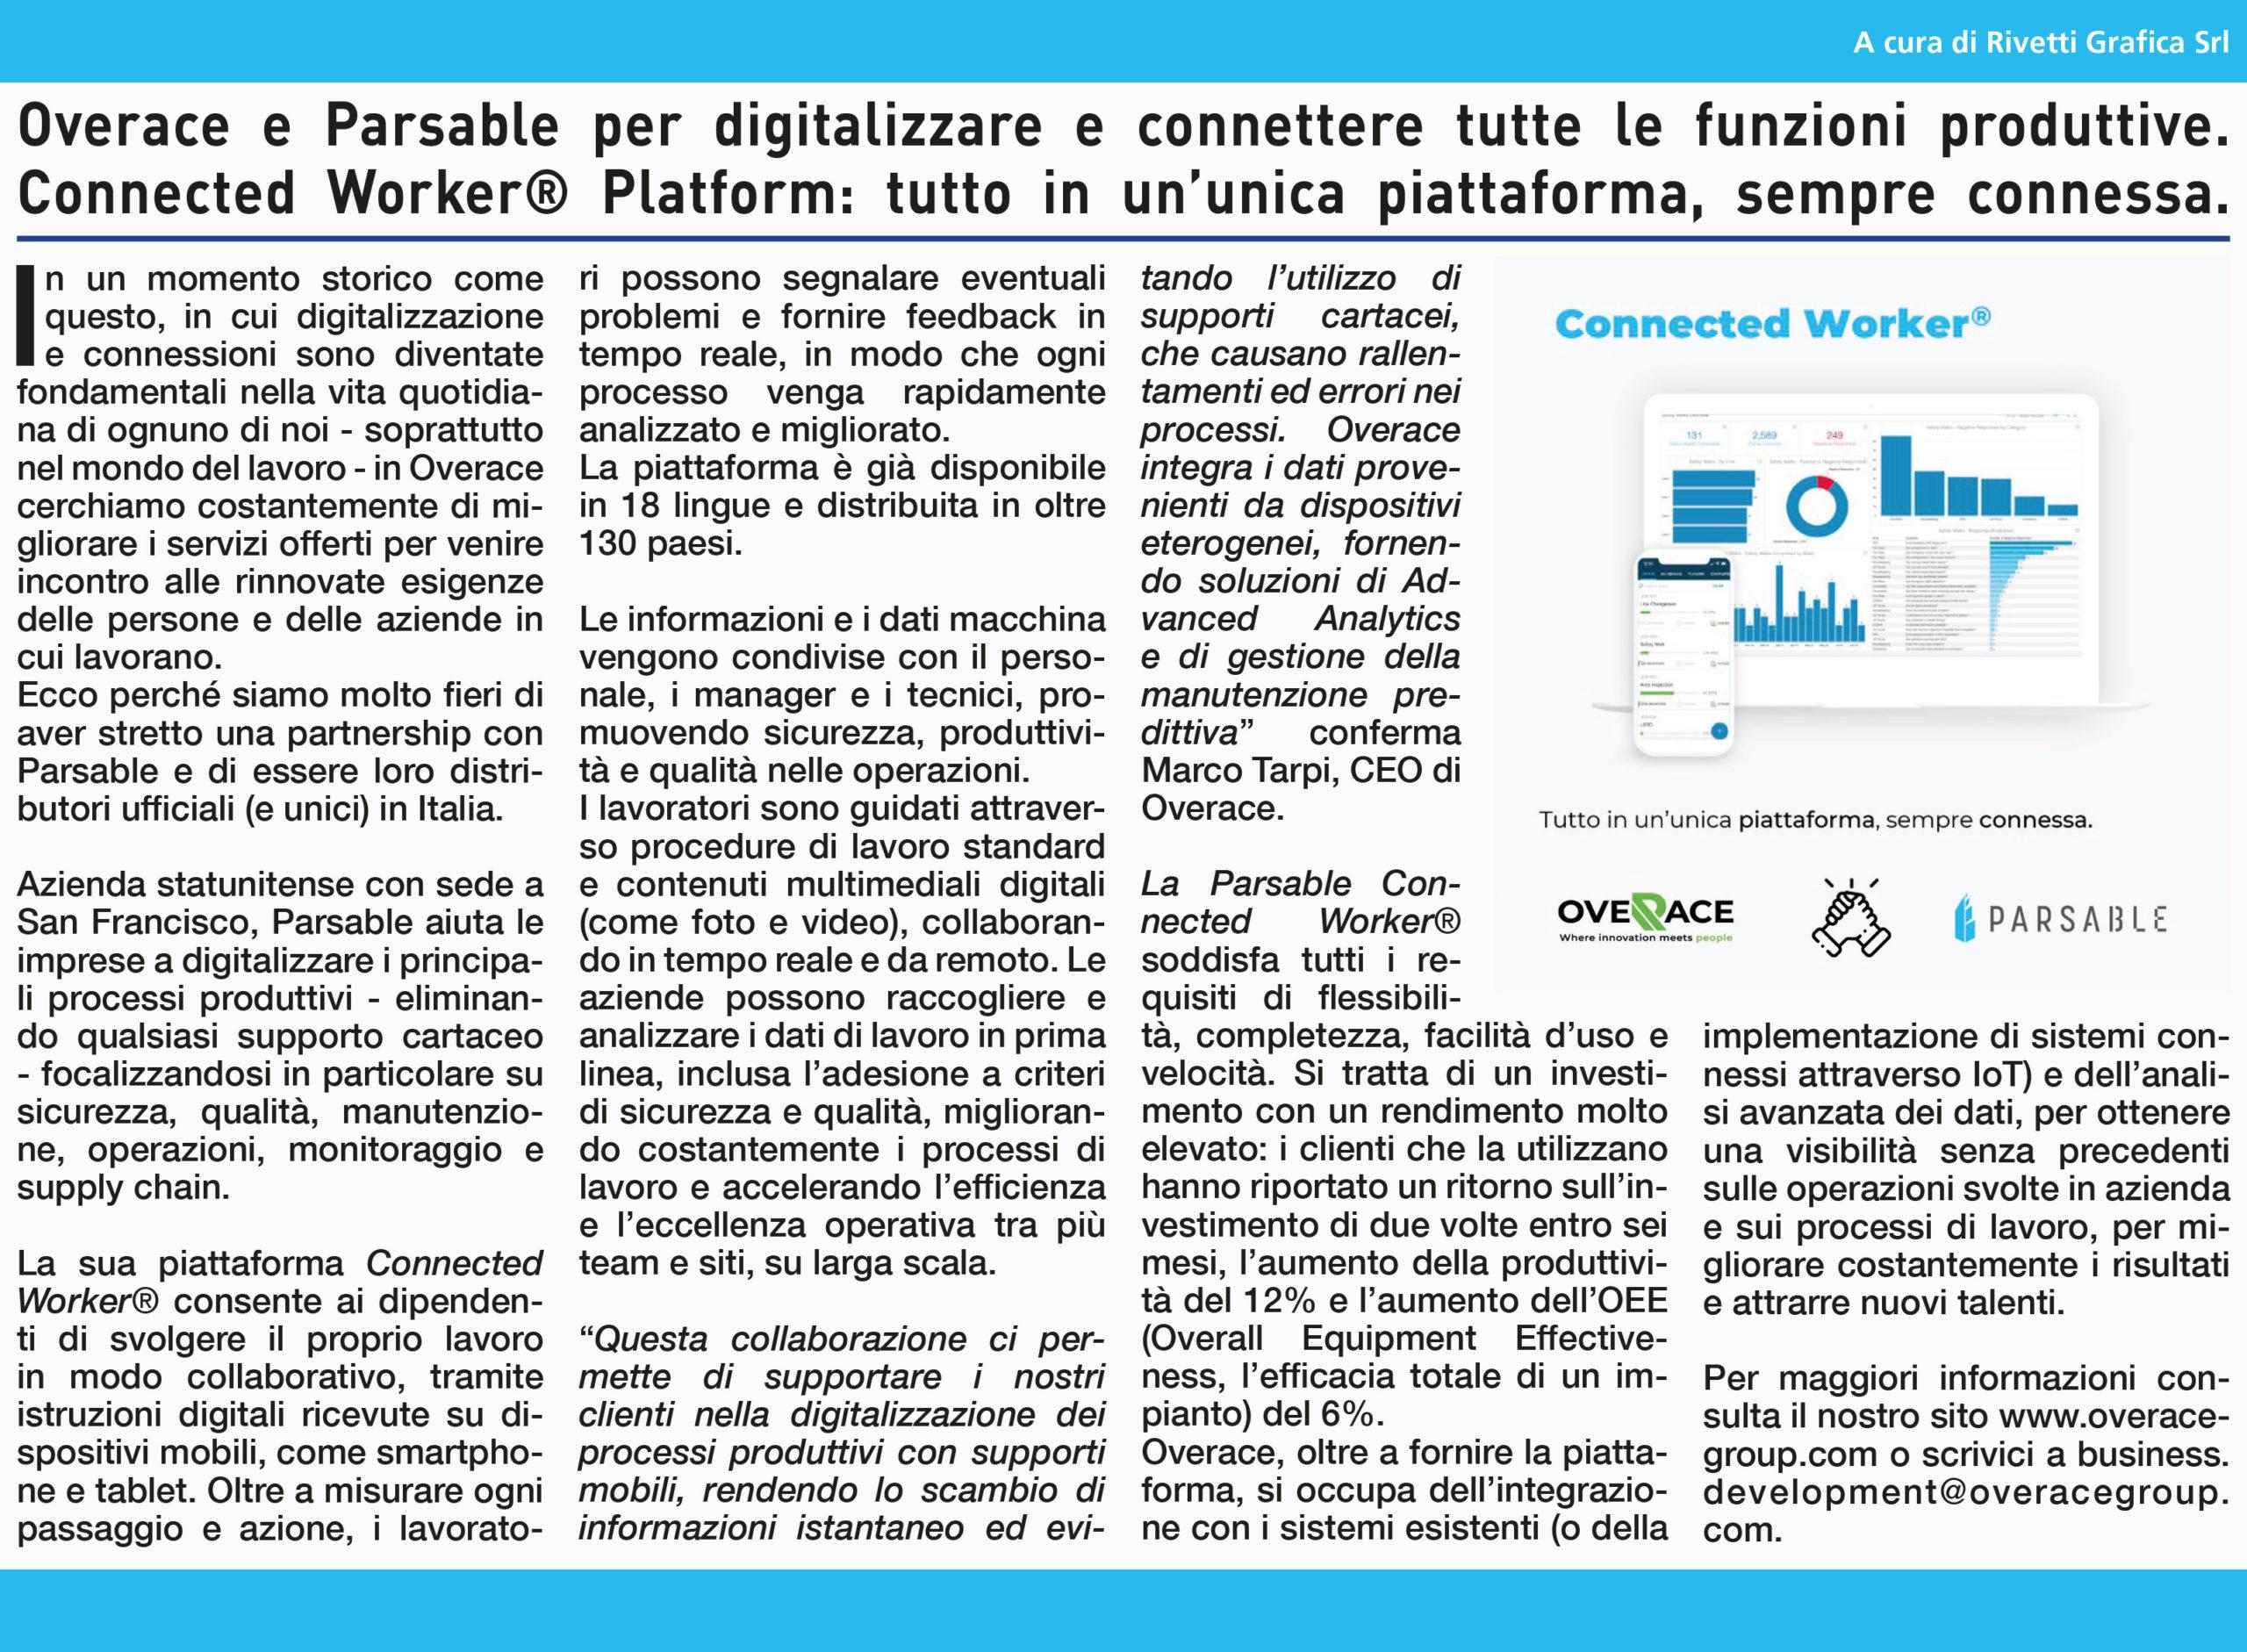 Overace-news-partnership-parsable